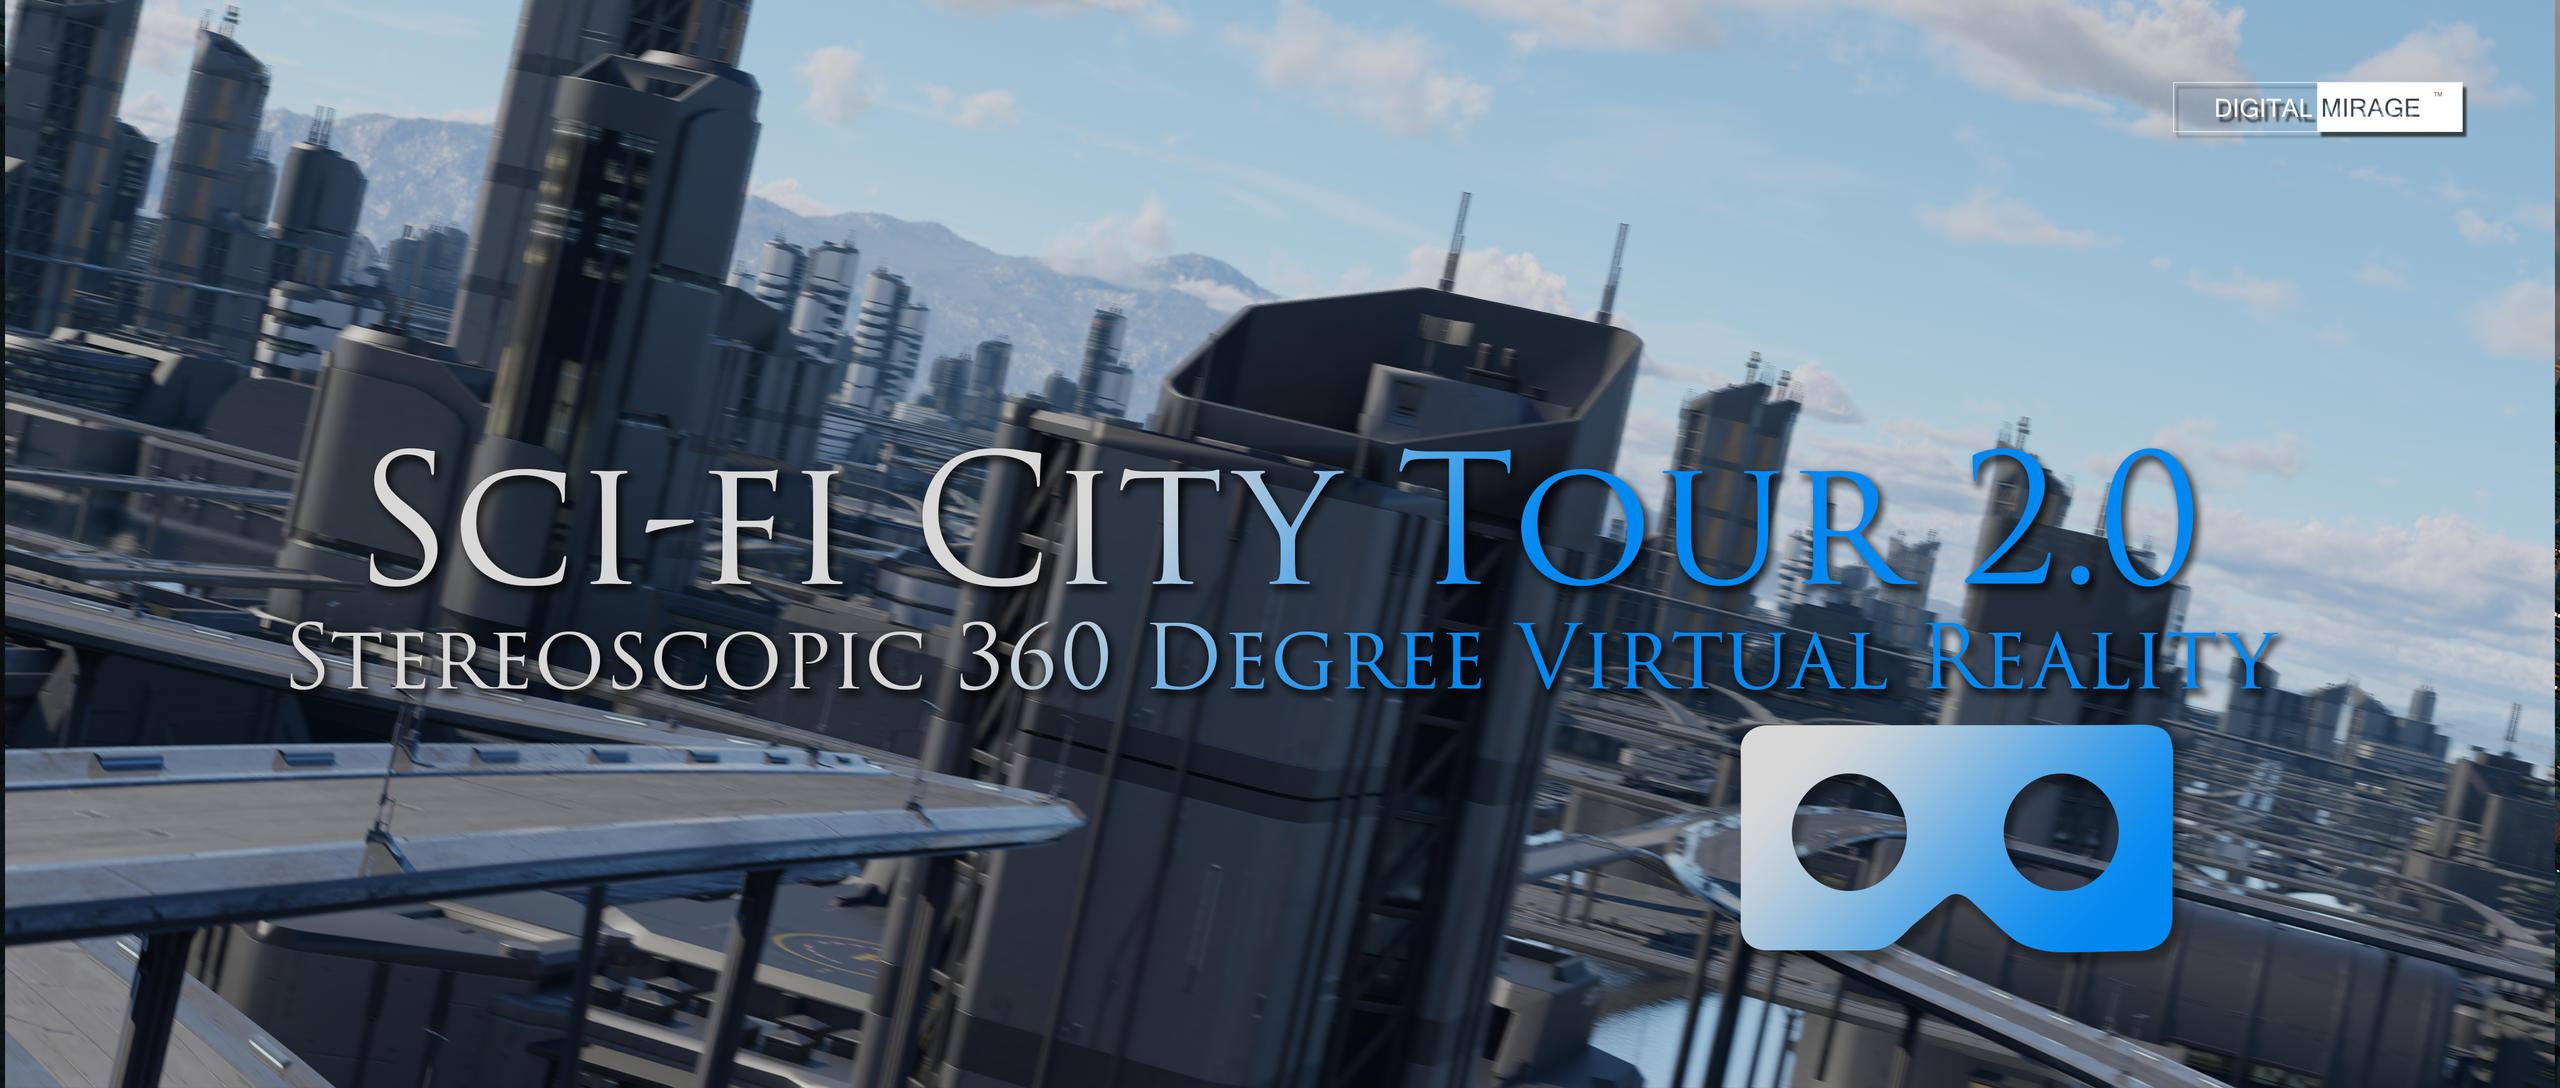 Sci-fi City VR 2.0 - thumbnail.jpg